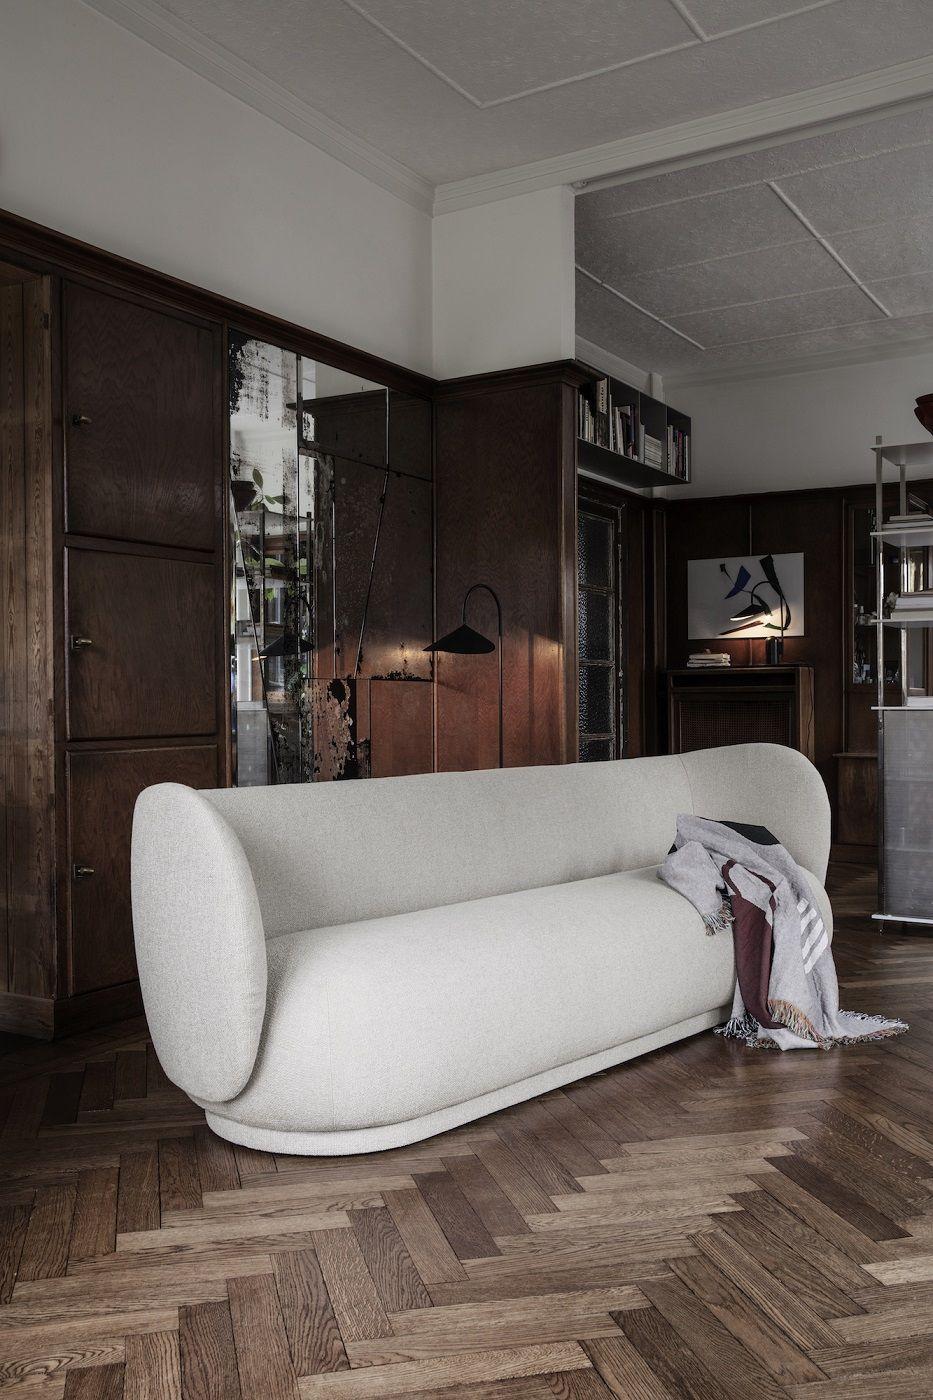 Ferm Living - Rico 3-pers. Sofa - Off White bouclé